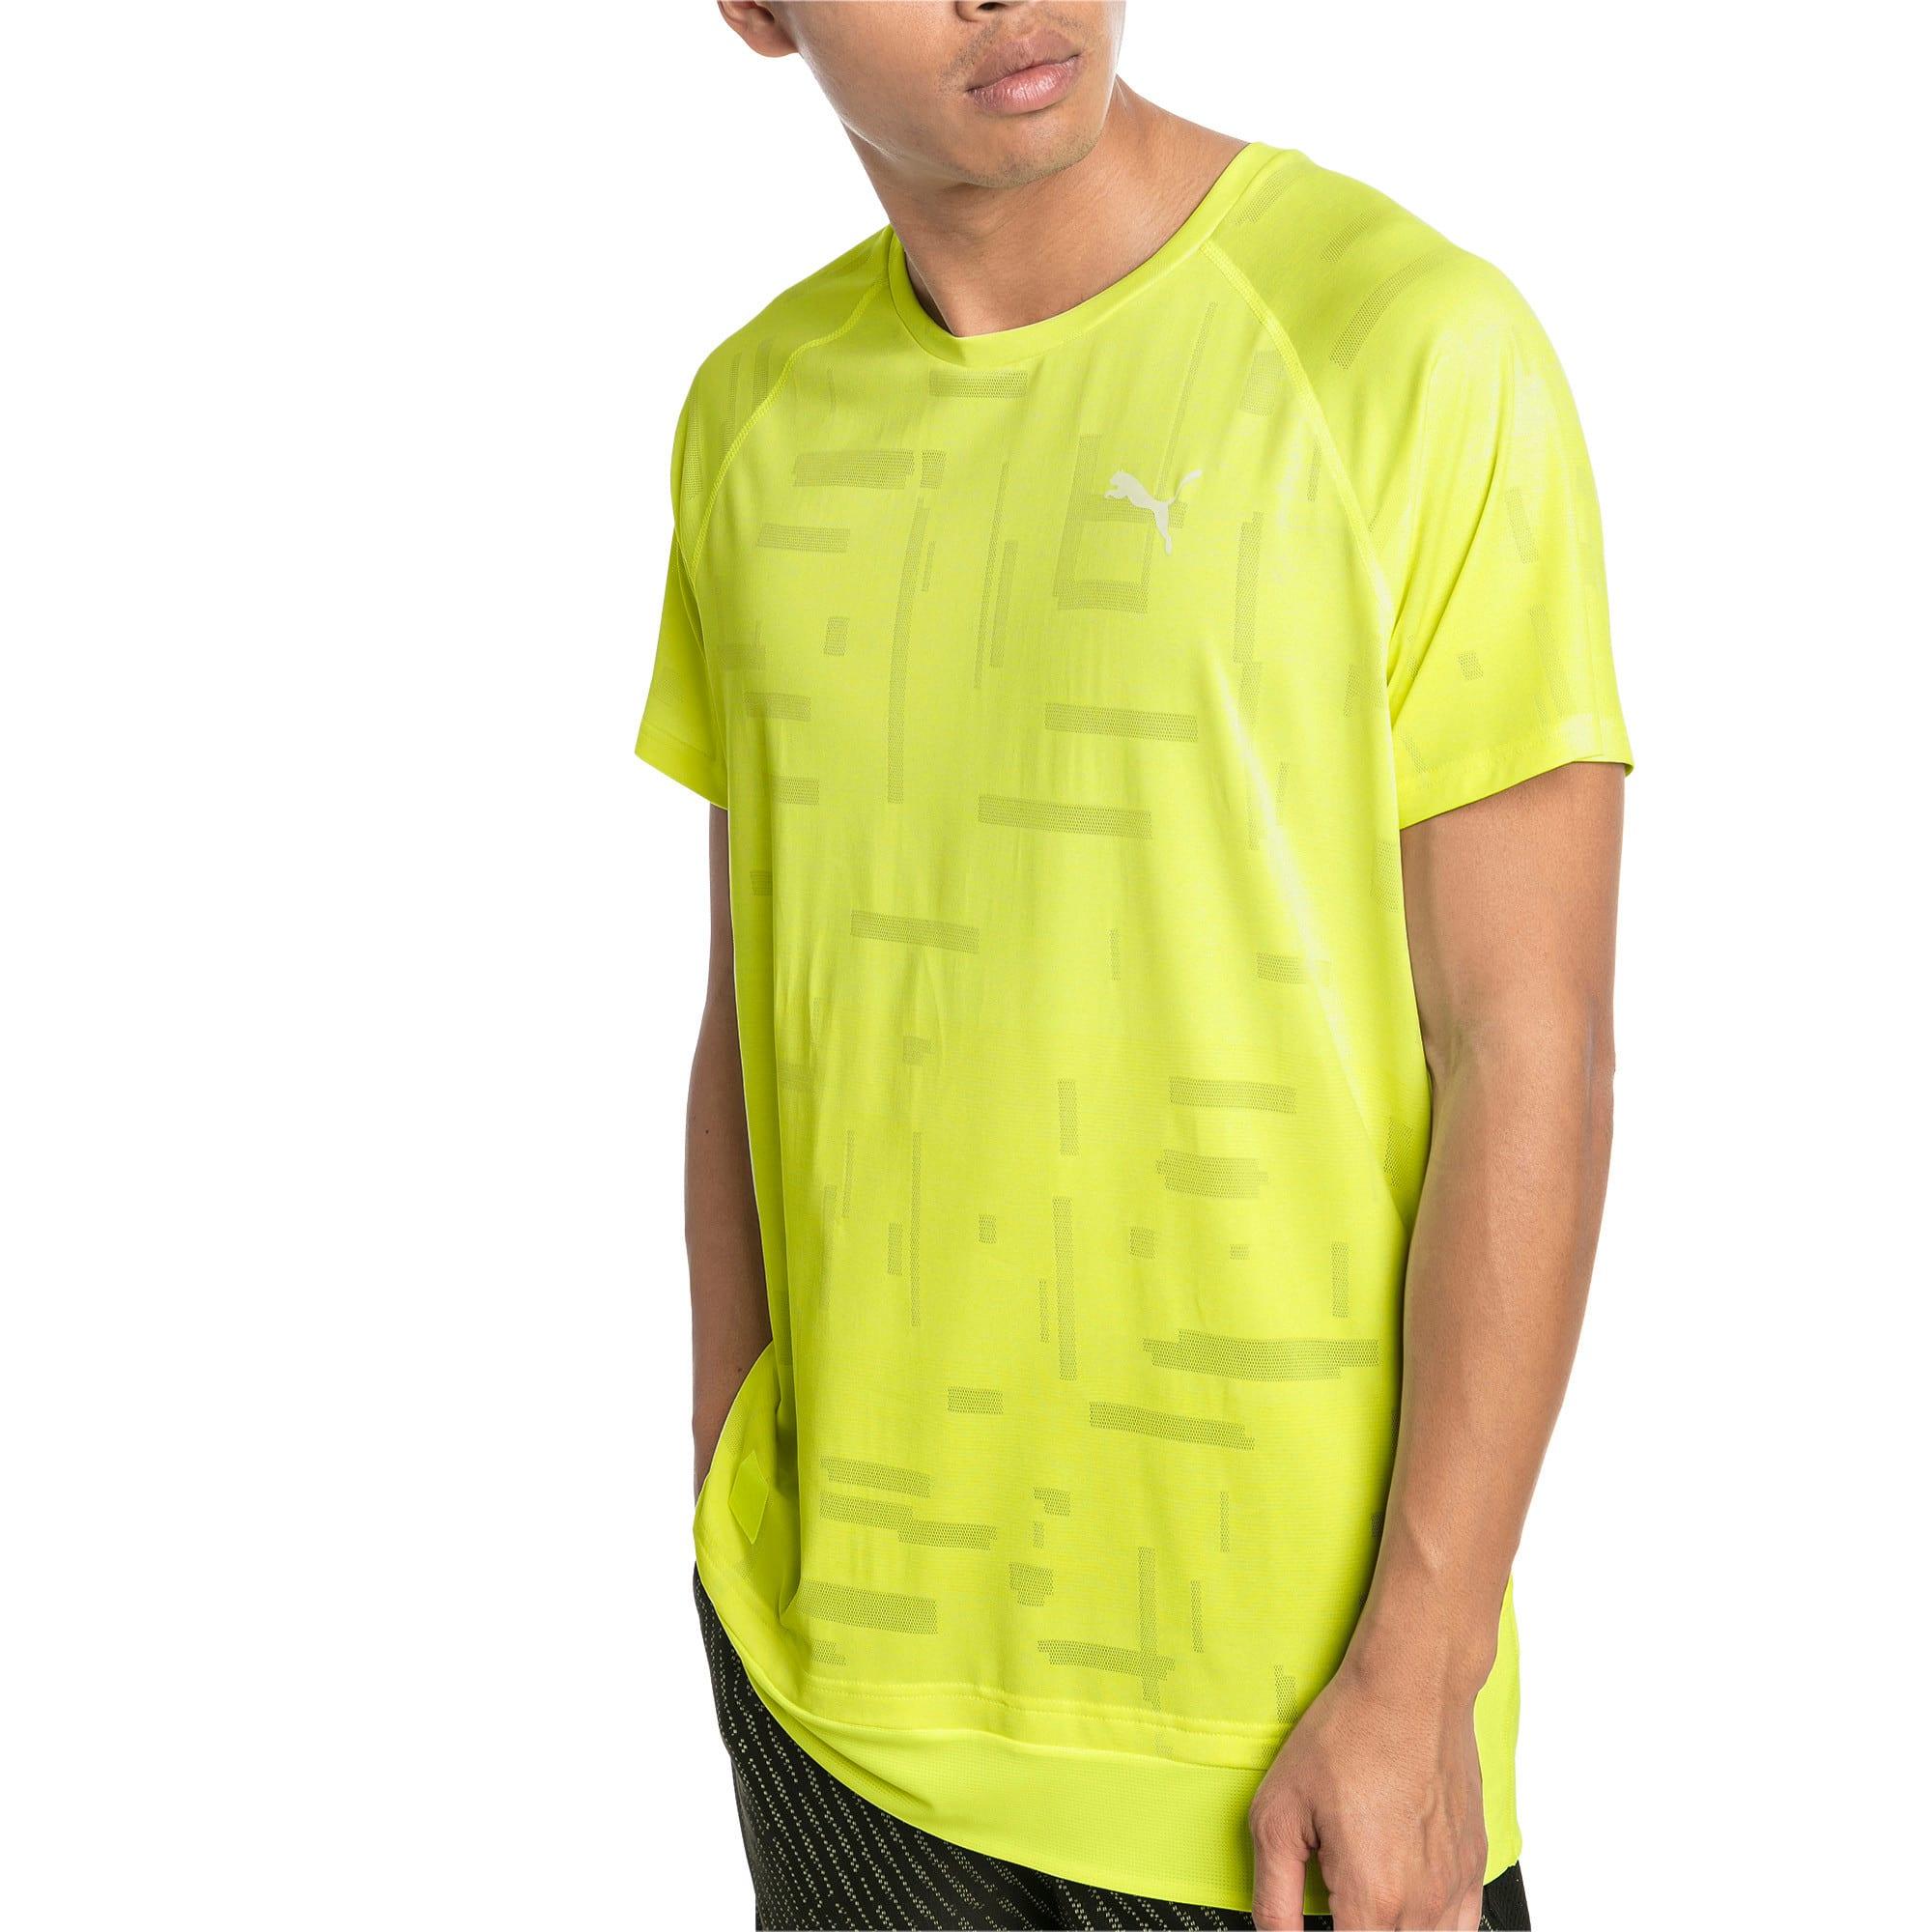 Thumbnail 1 of Energy Tech Herren Training T-Shirt, Fizzy Yellow, medium